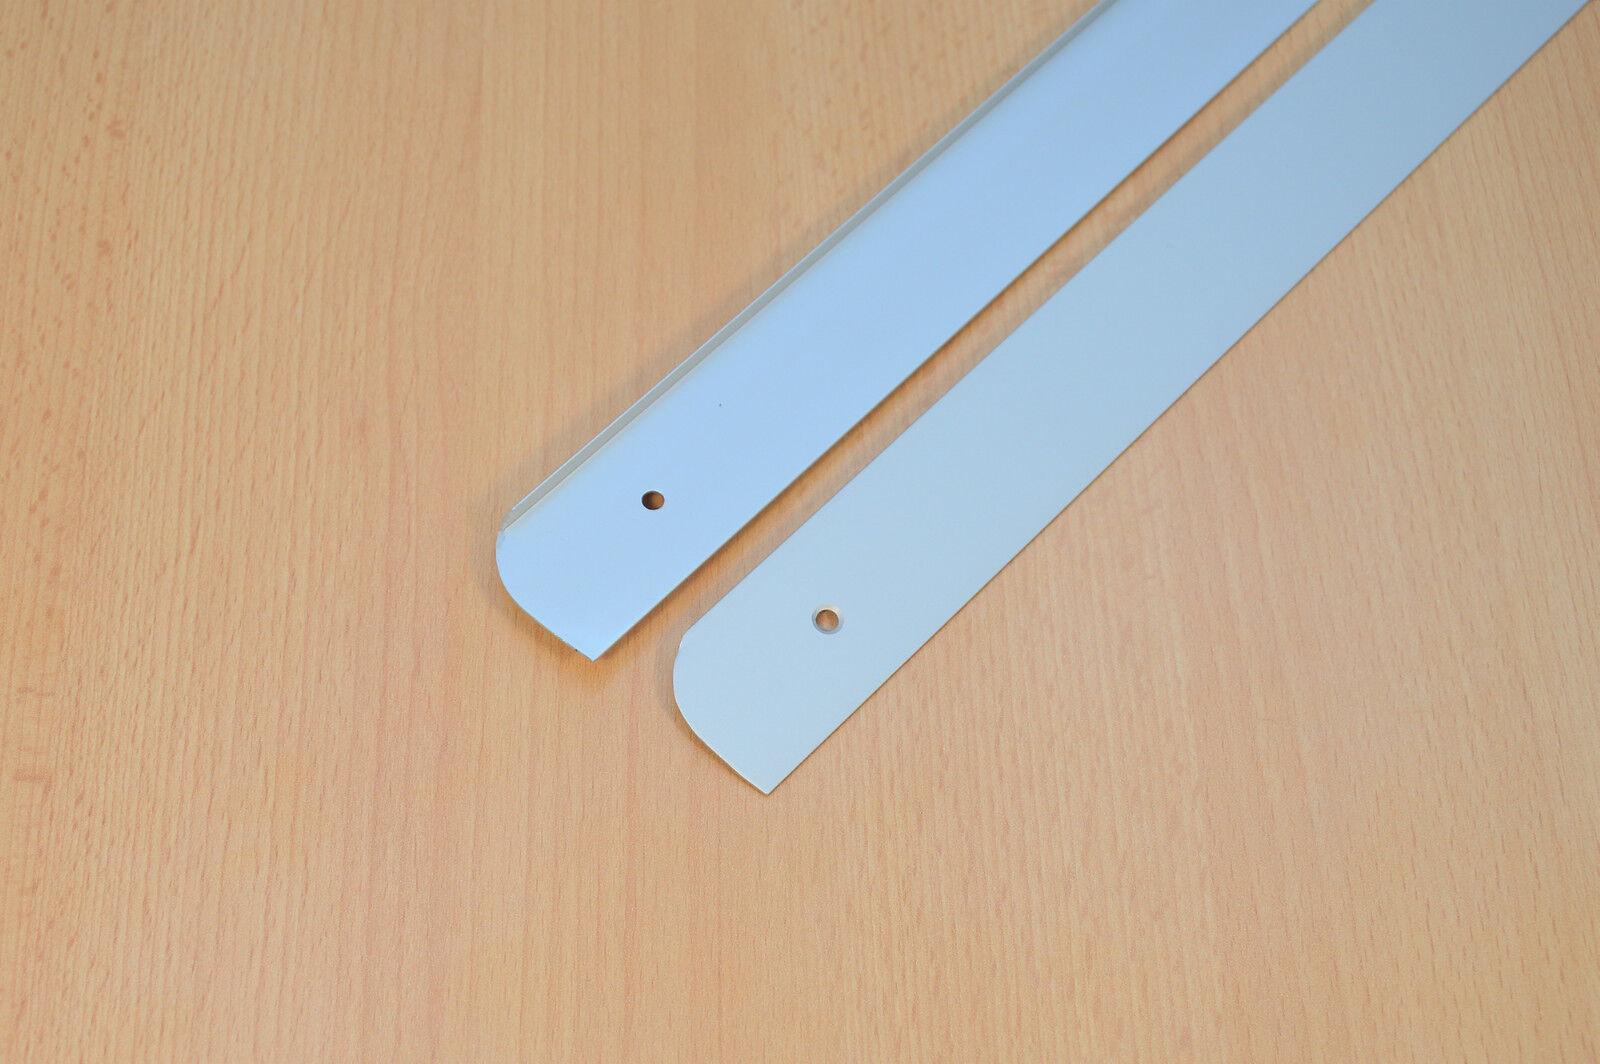 ABSCHLUSSLEISTE Winkelleisten Seiteleiste Arbeitsplatte k/üche endeleiste 38 mm